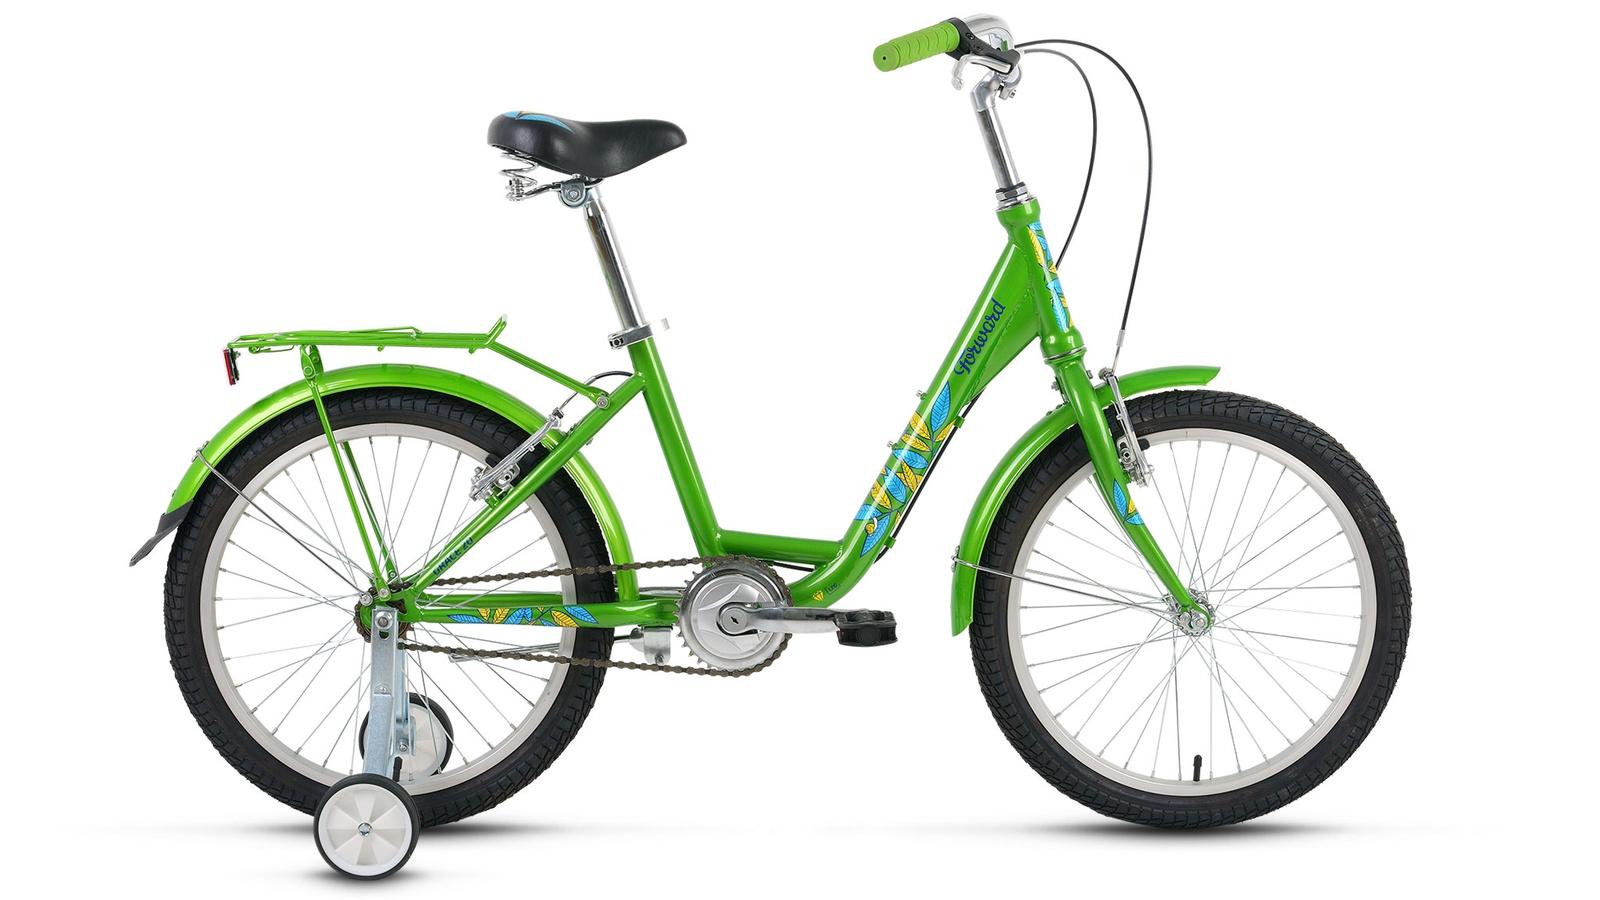 GRACE 20 2016 велосипед apollo aspire 20 ws 2016